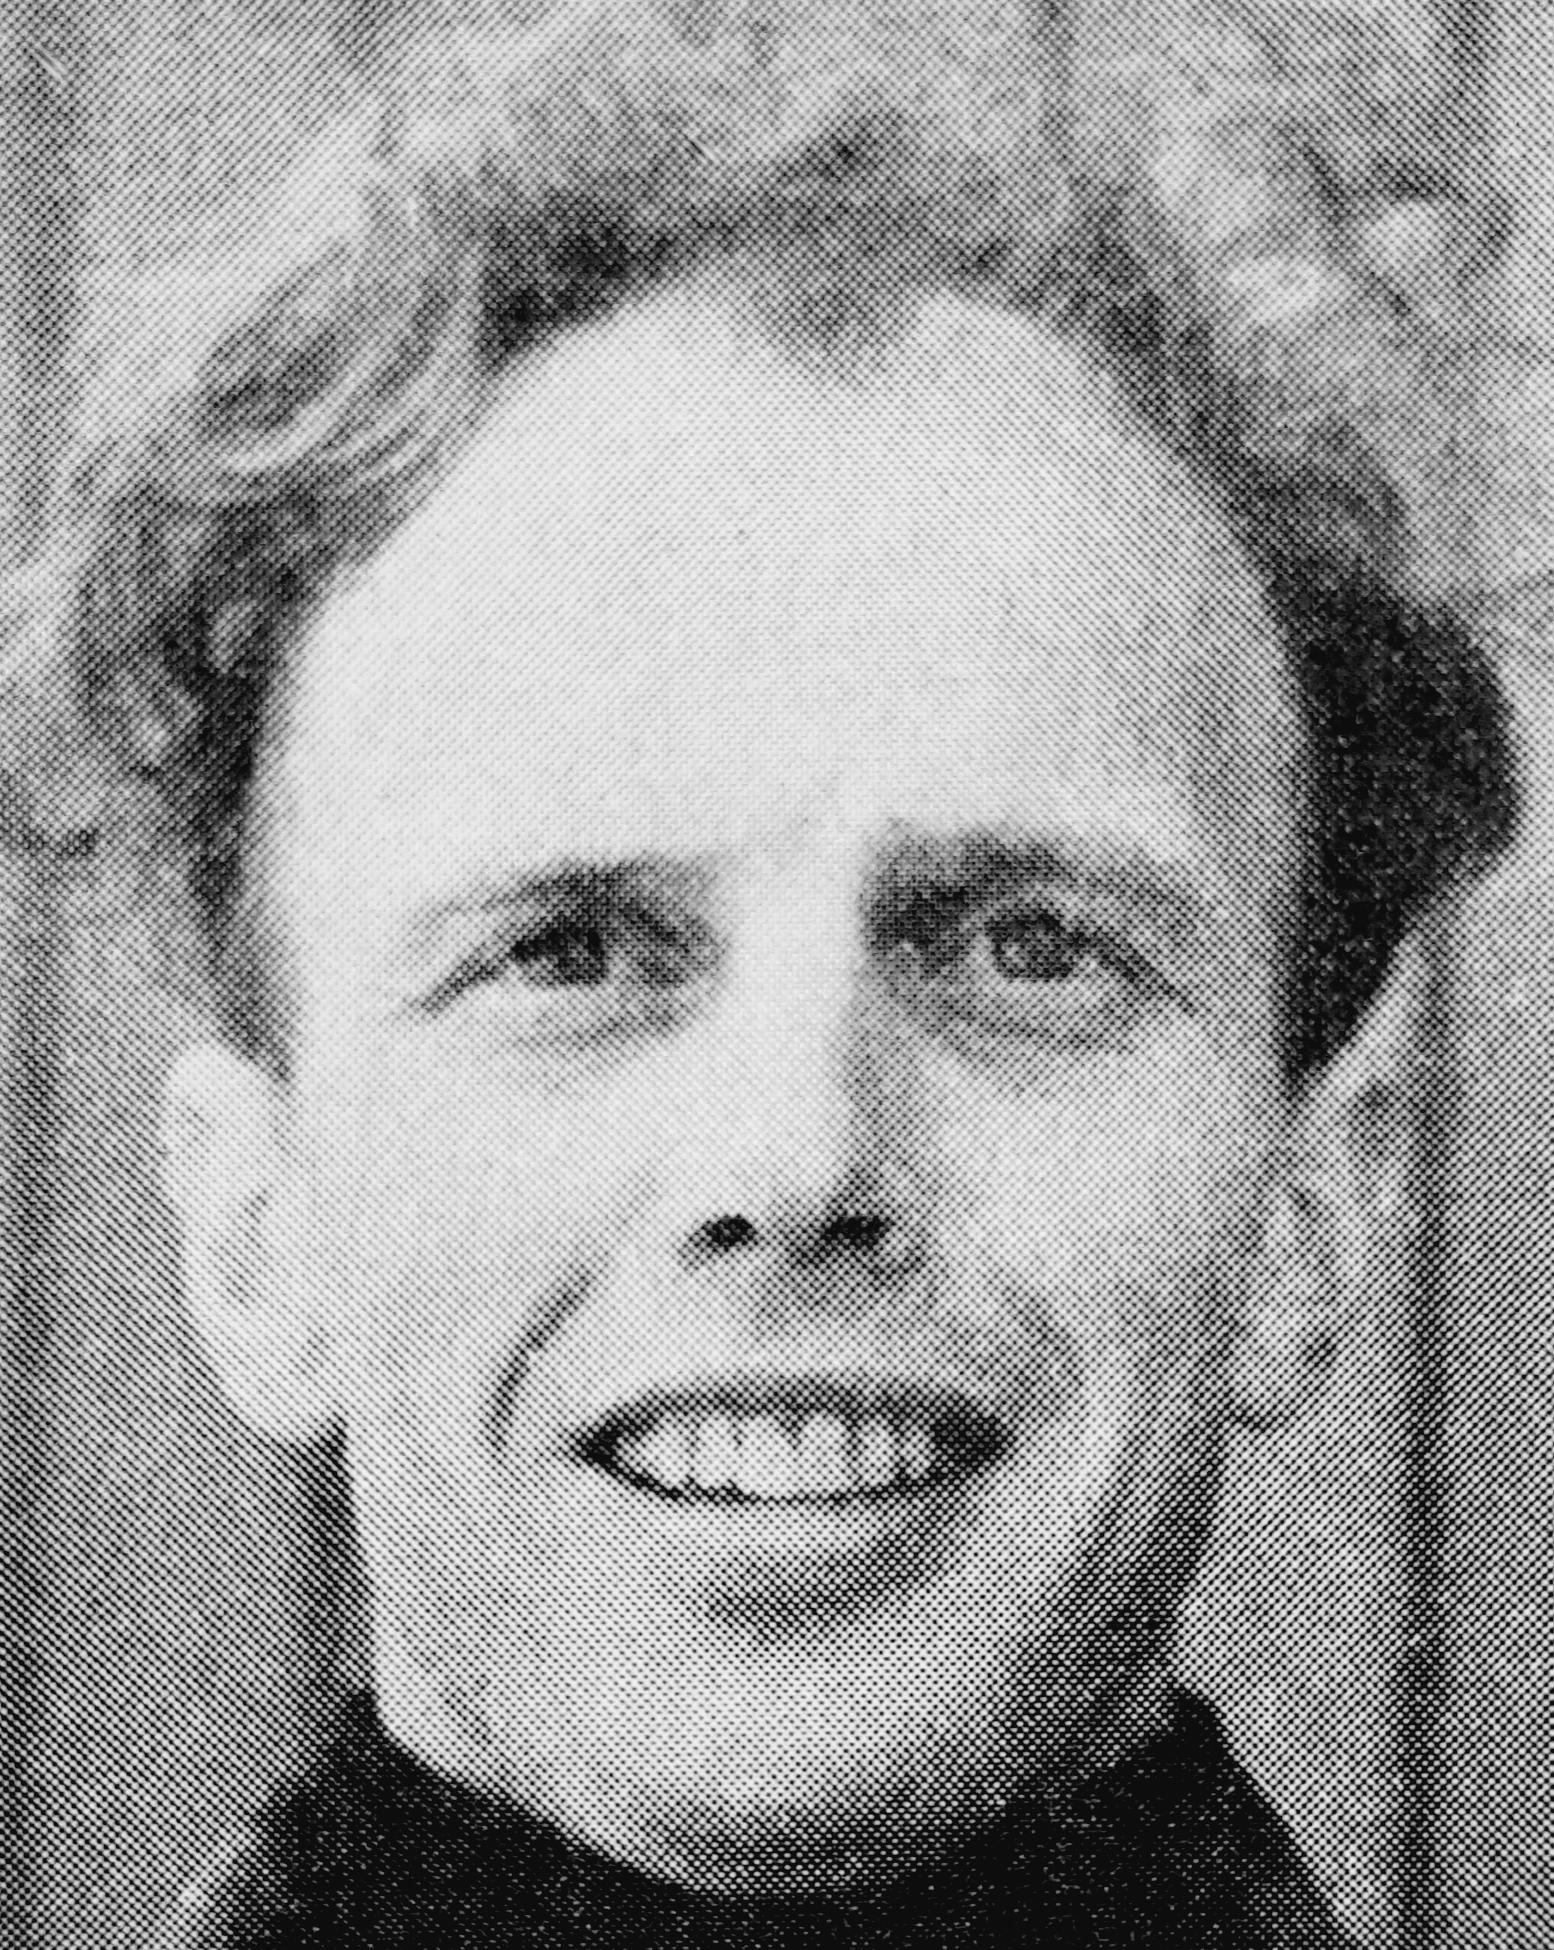 Image of Carl Nesjar from Wikidata